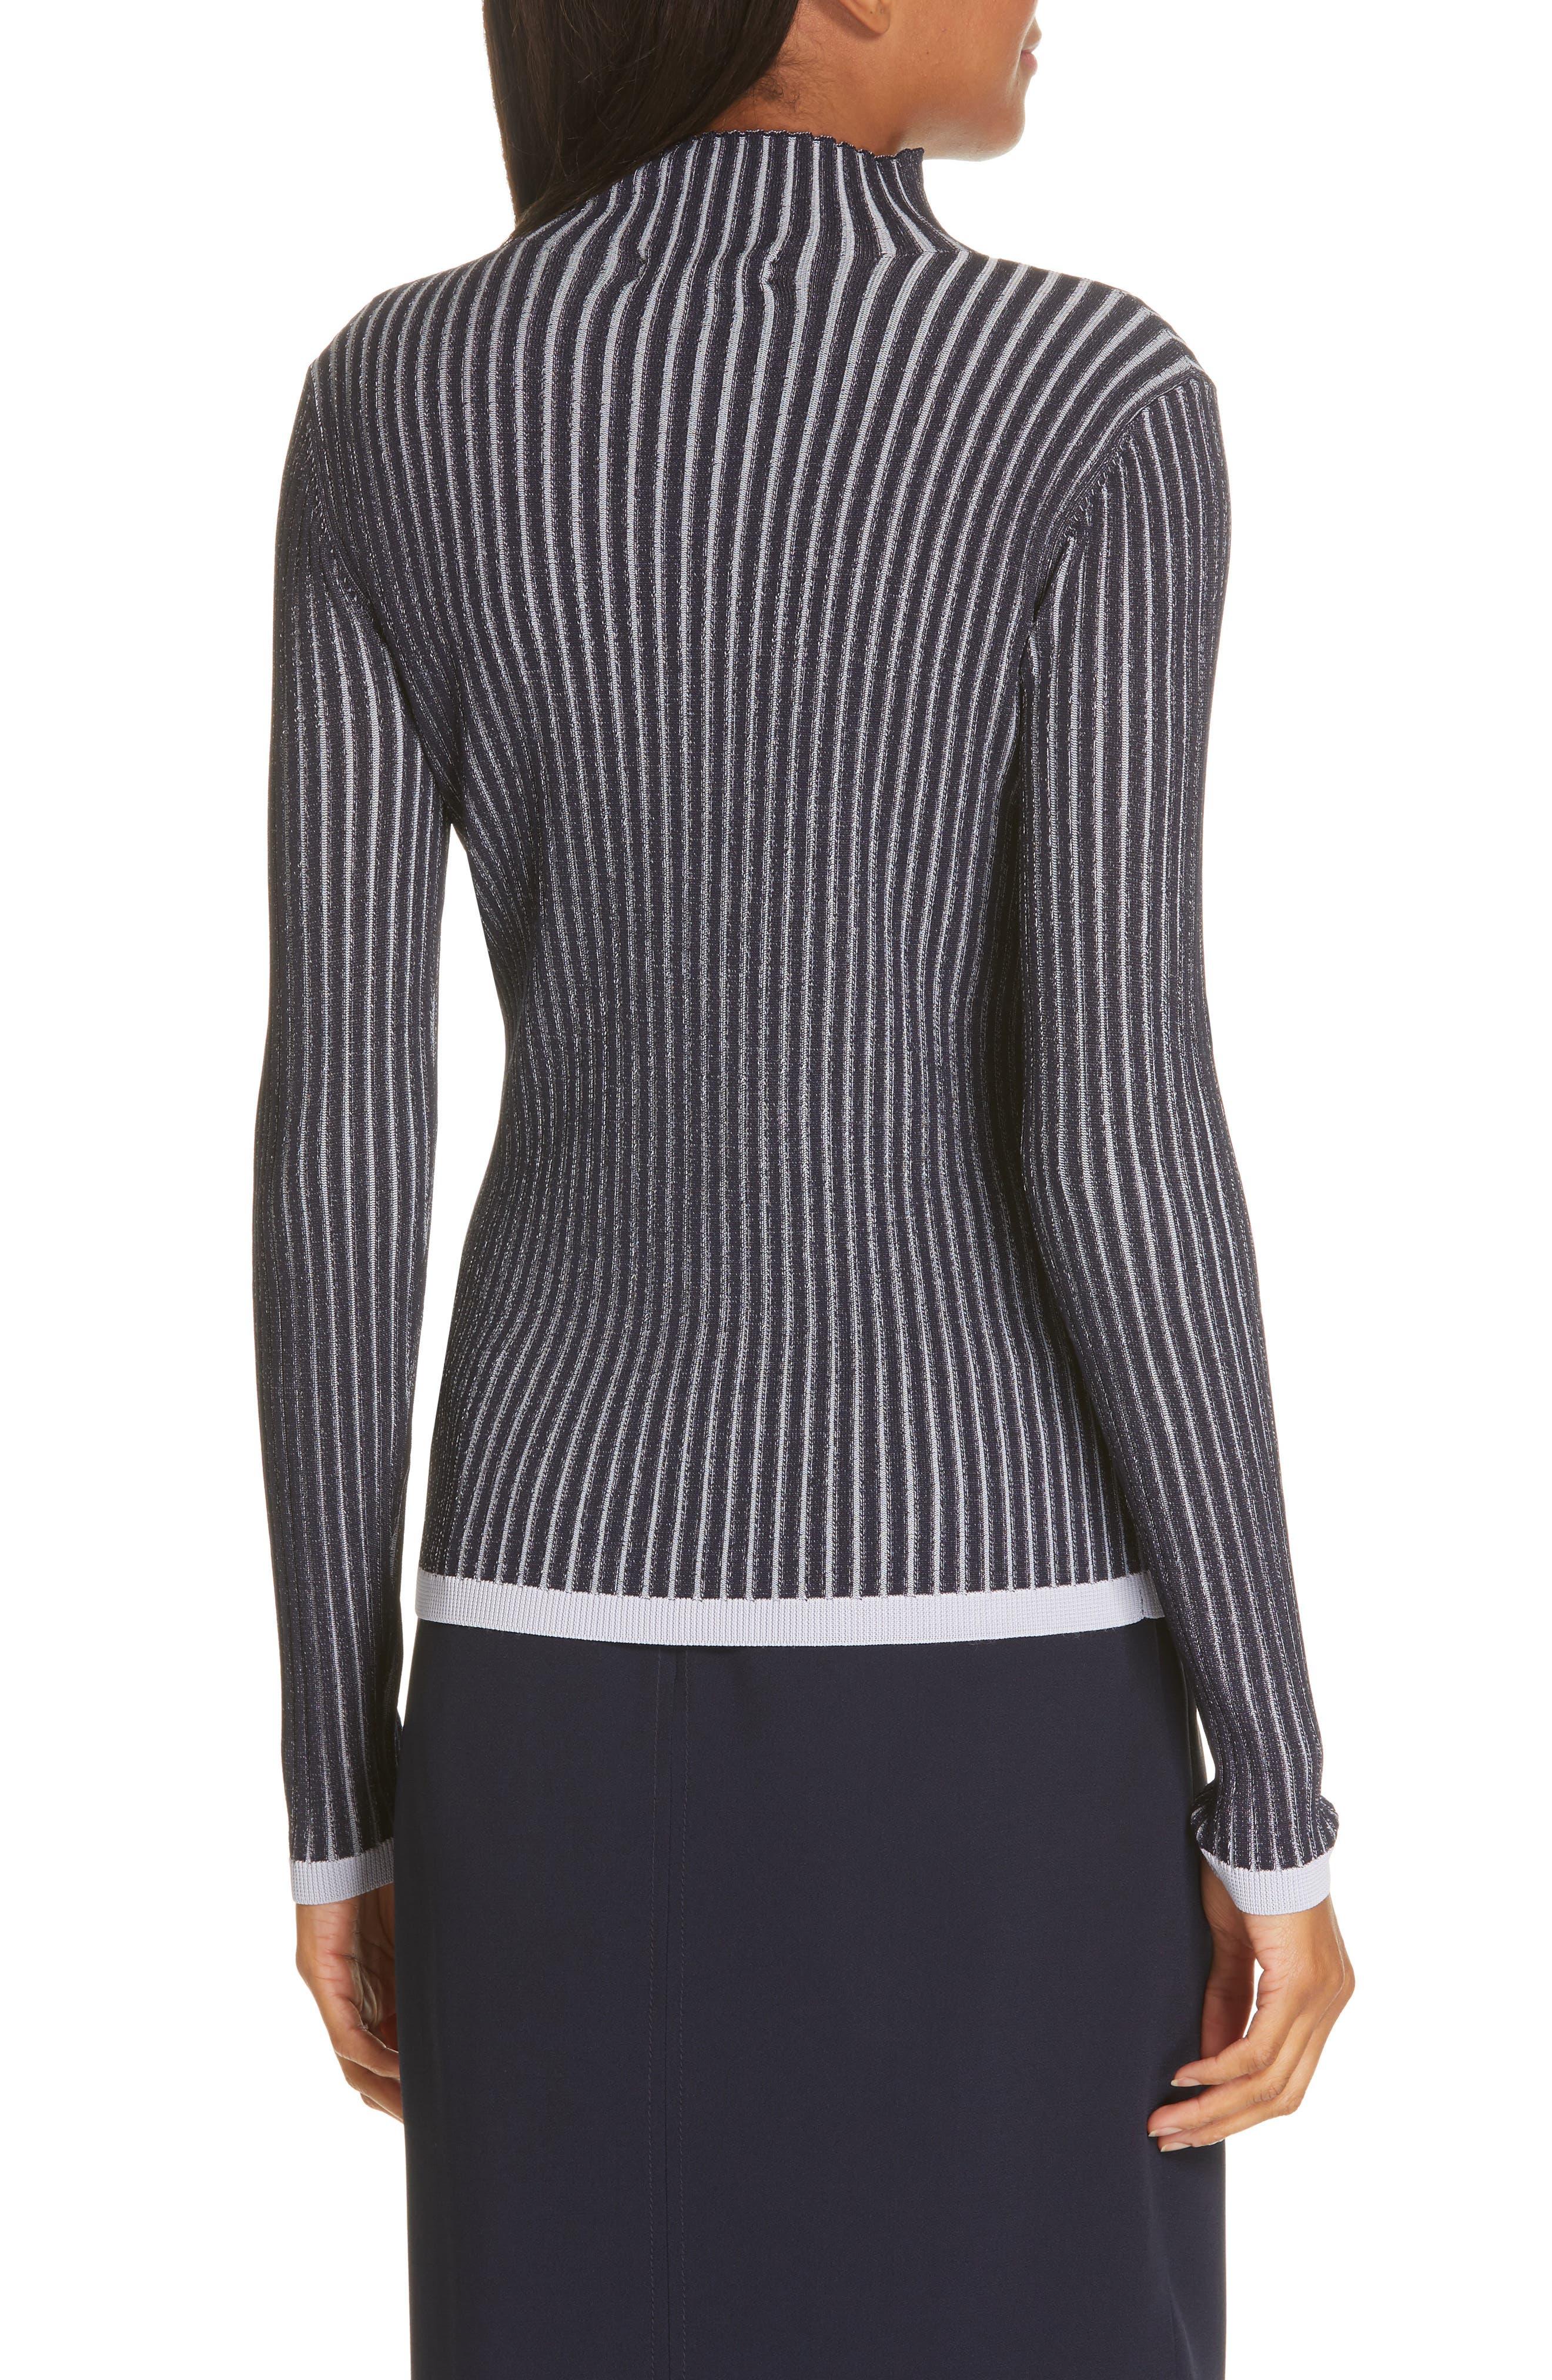 LEWIT, Stripe Ribbed Mock Neck Sweater, Alternate thumbnail 2, color, NAVY ICELANDIC STRIPE